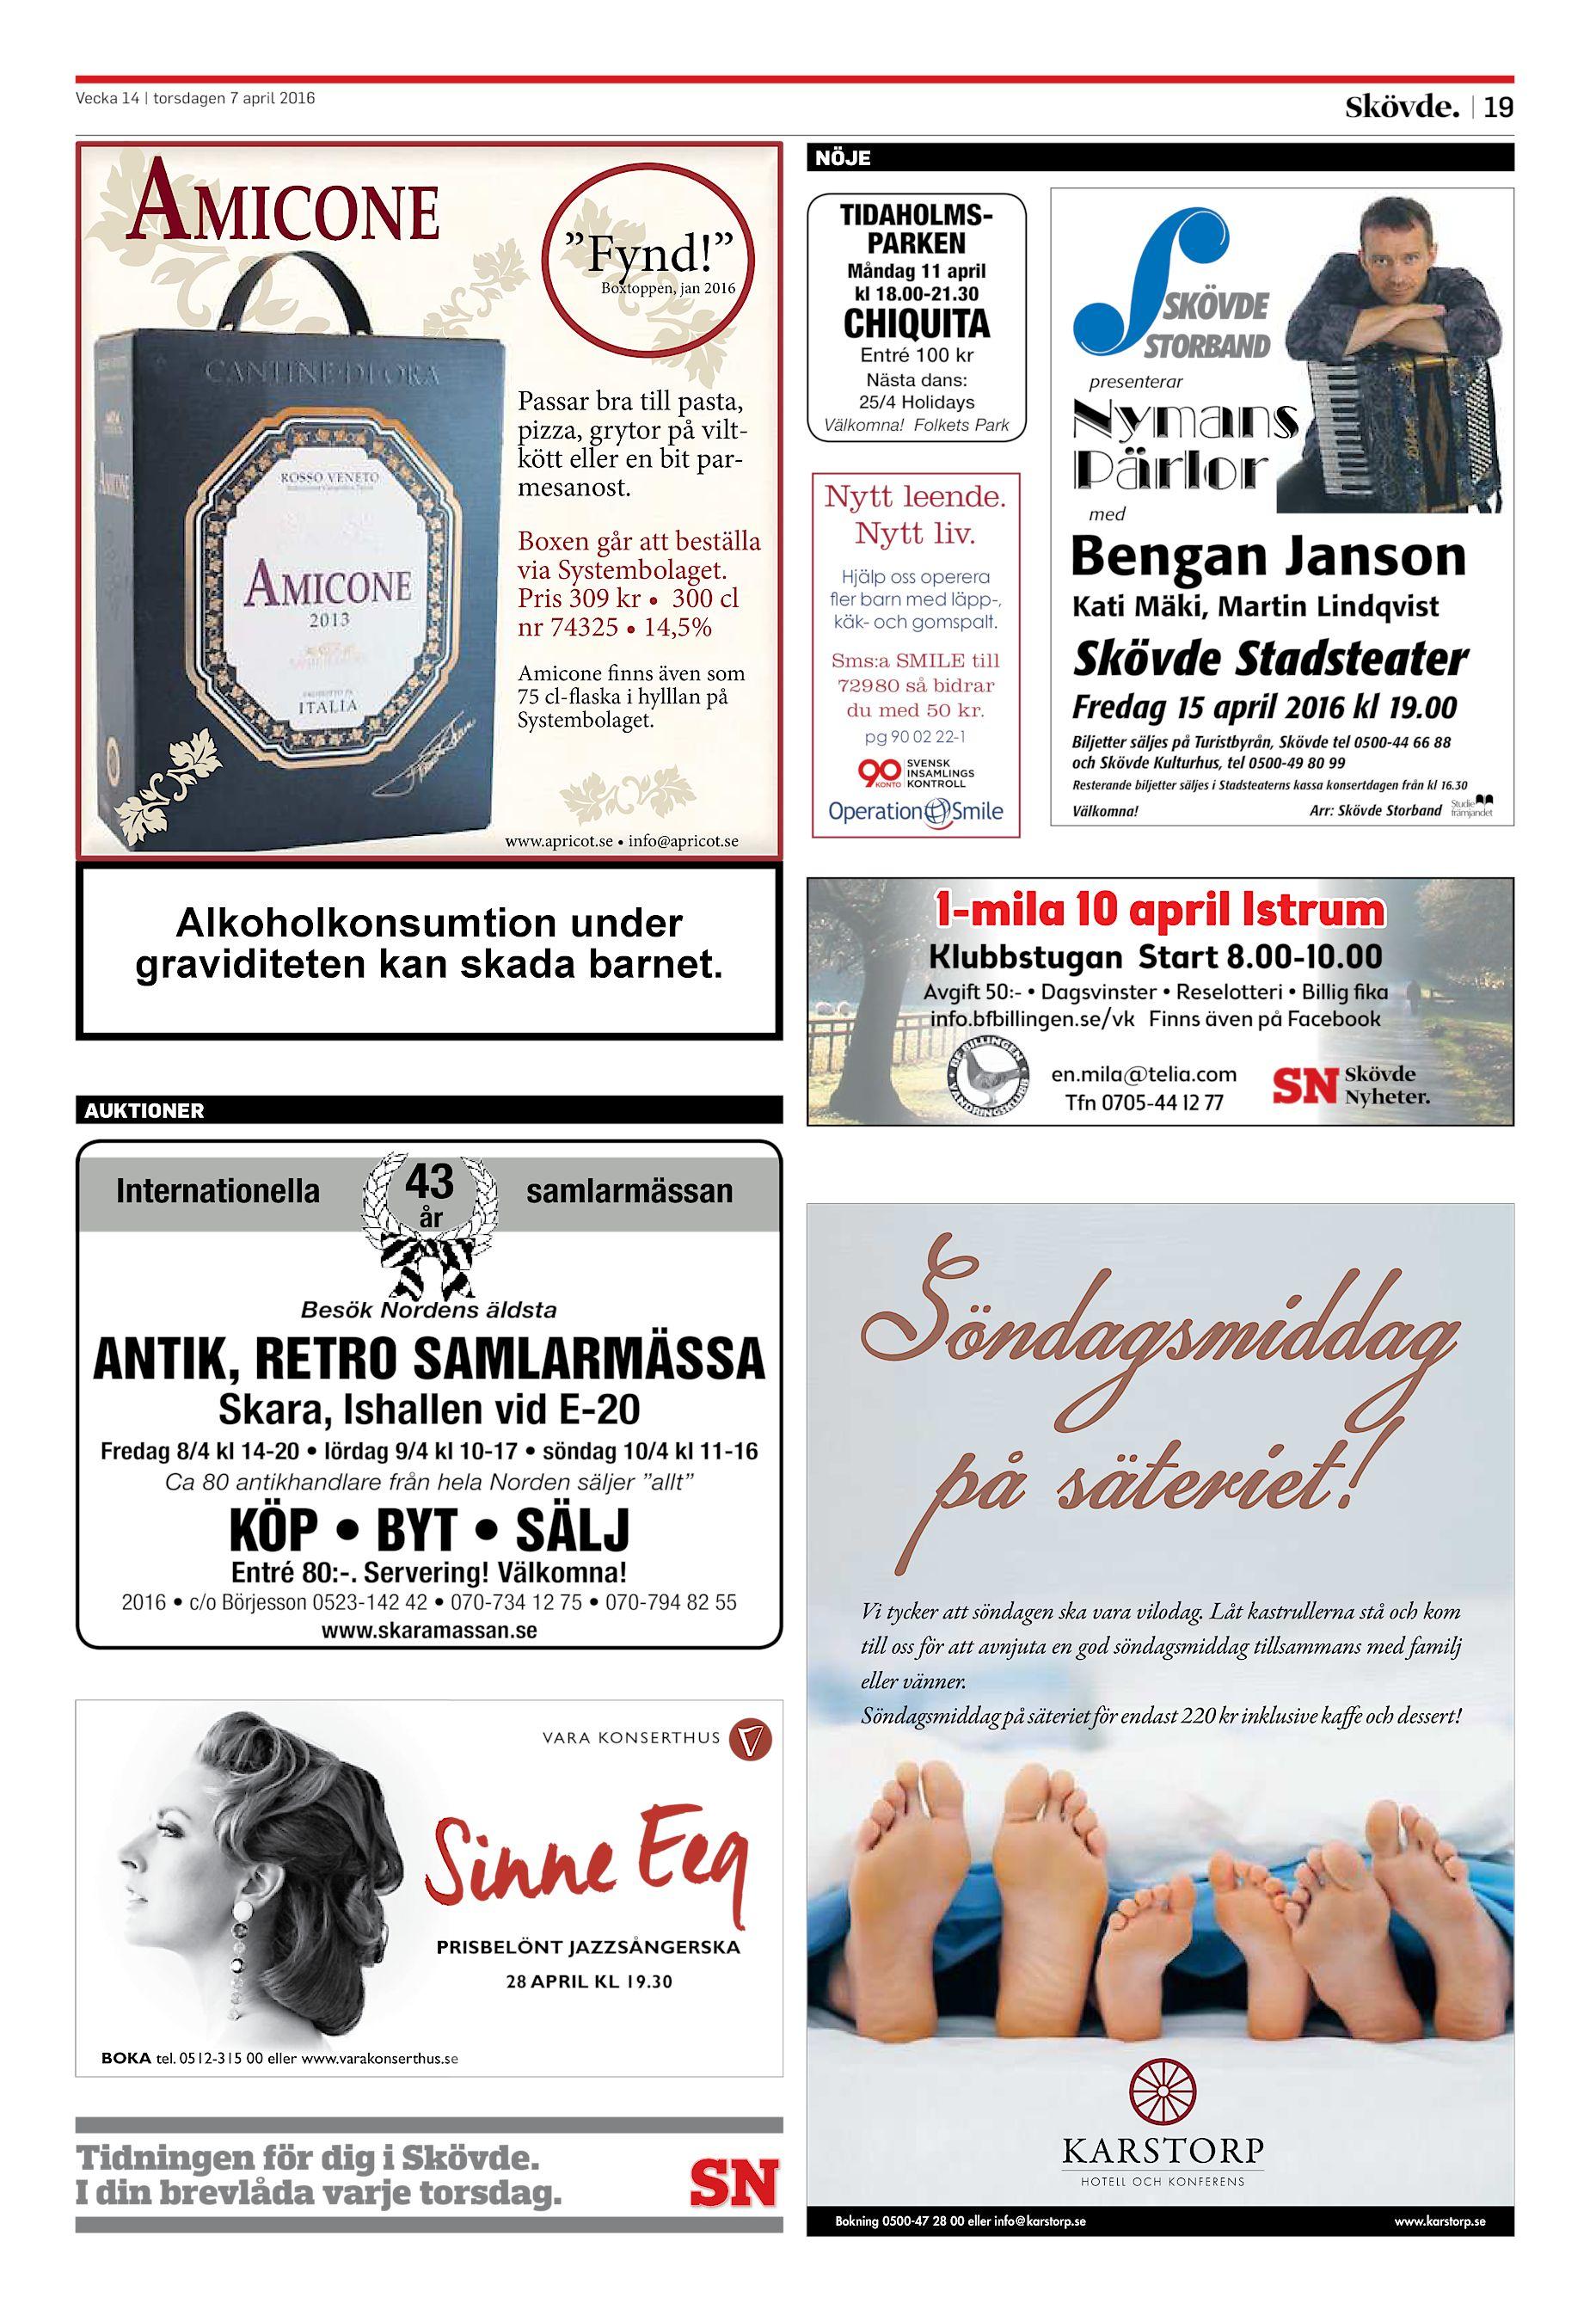 Skövde Nyheter SN-20160407 (endast text) cb9890d132c06